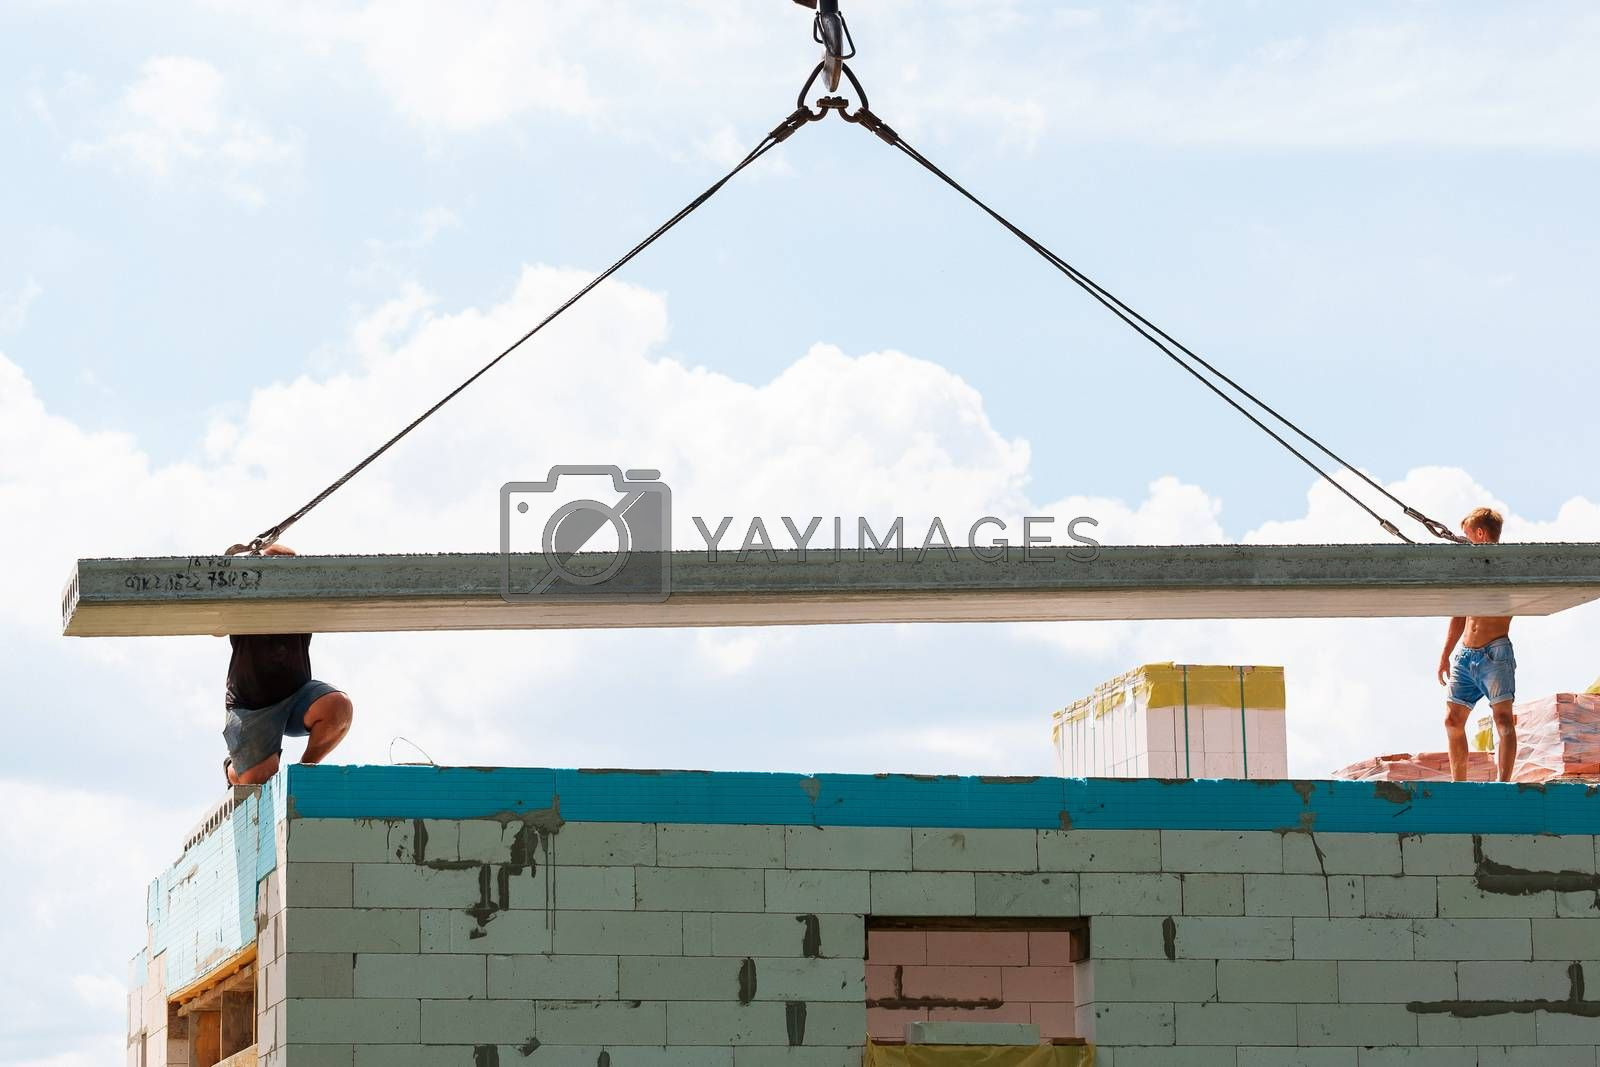 Builder worker installing concrete floor slab panel at building construction site by Len44ik